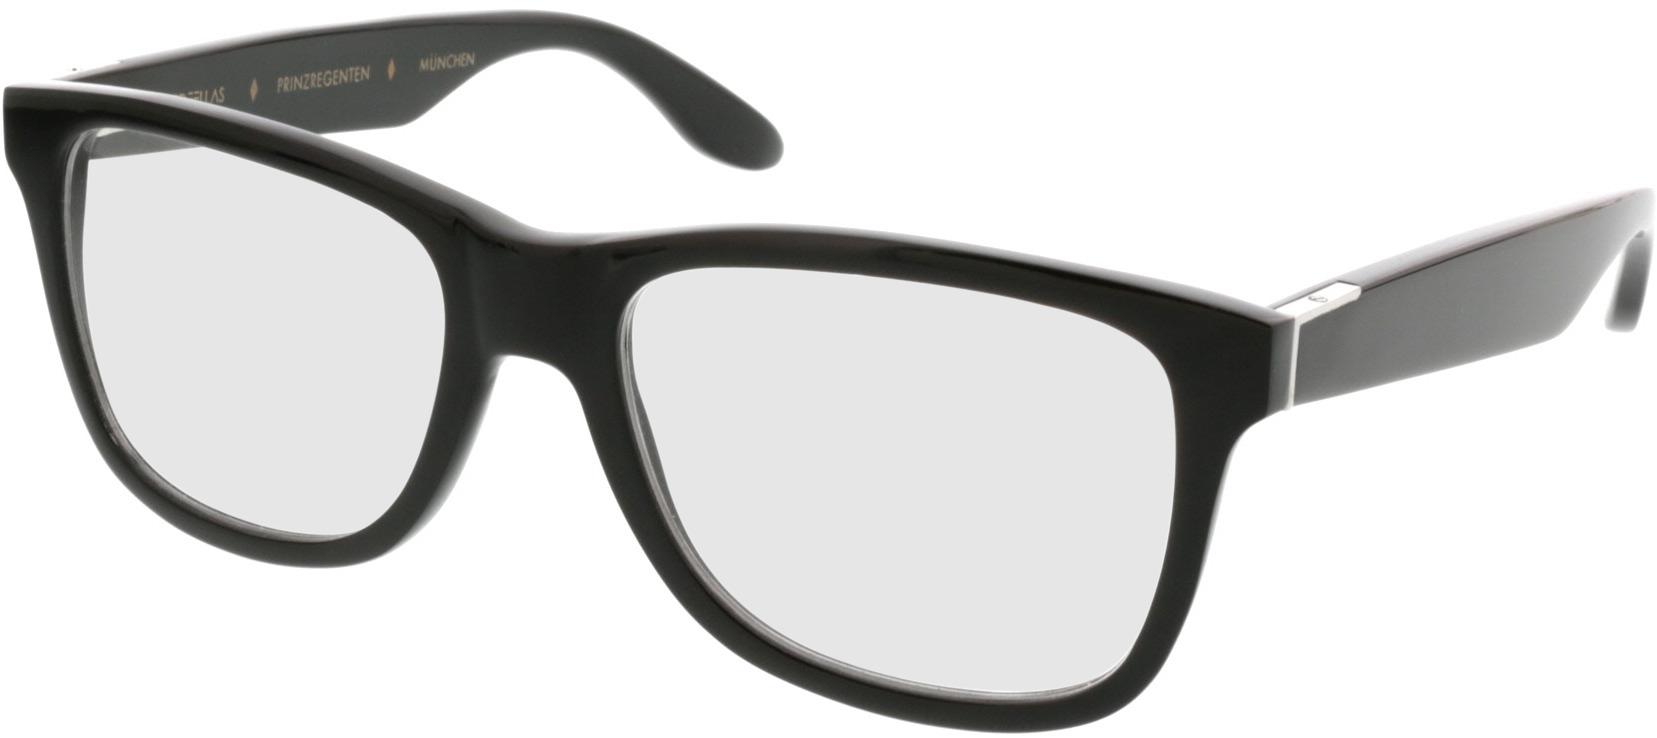 Picture of glasses model Wood Fellas Optical Prinzregenten dark brown 53-18 in angle 330